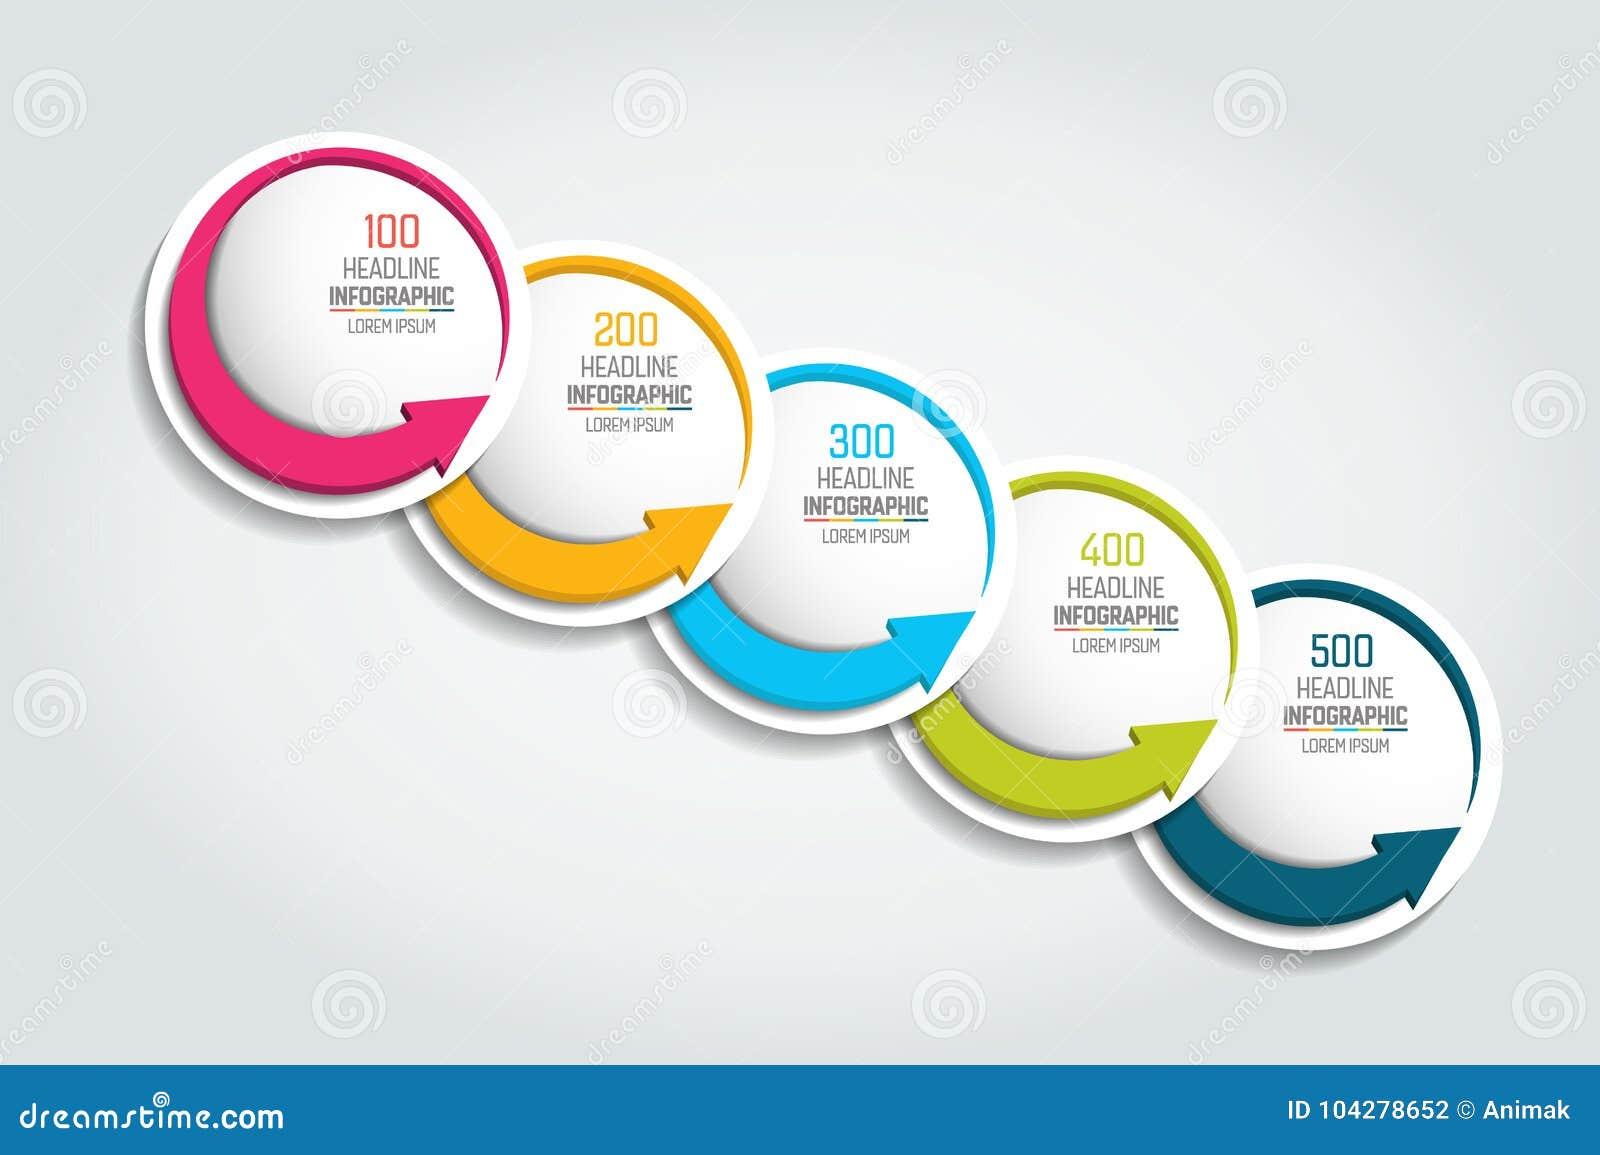 Option chart, scheme, diagram, timeline. 5 Infographic template.